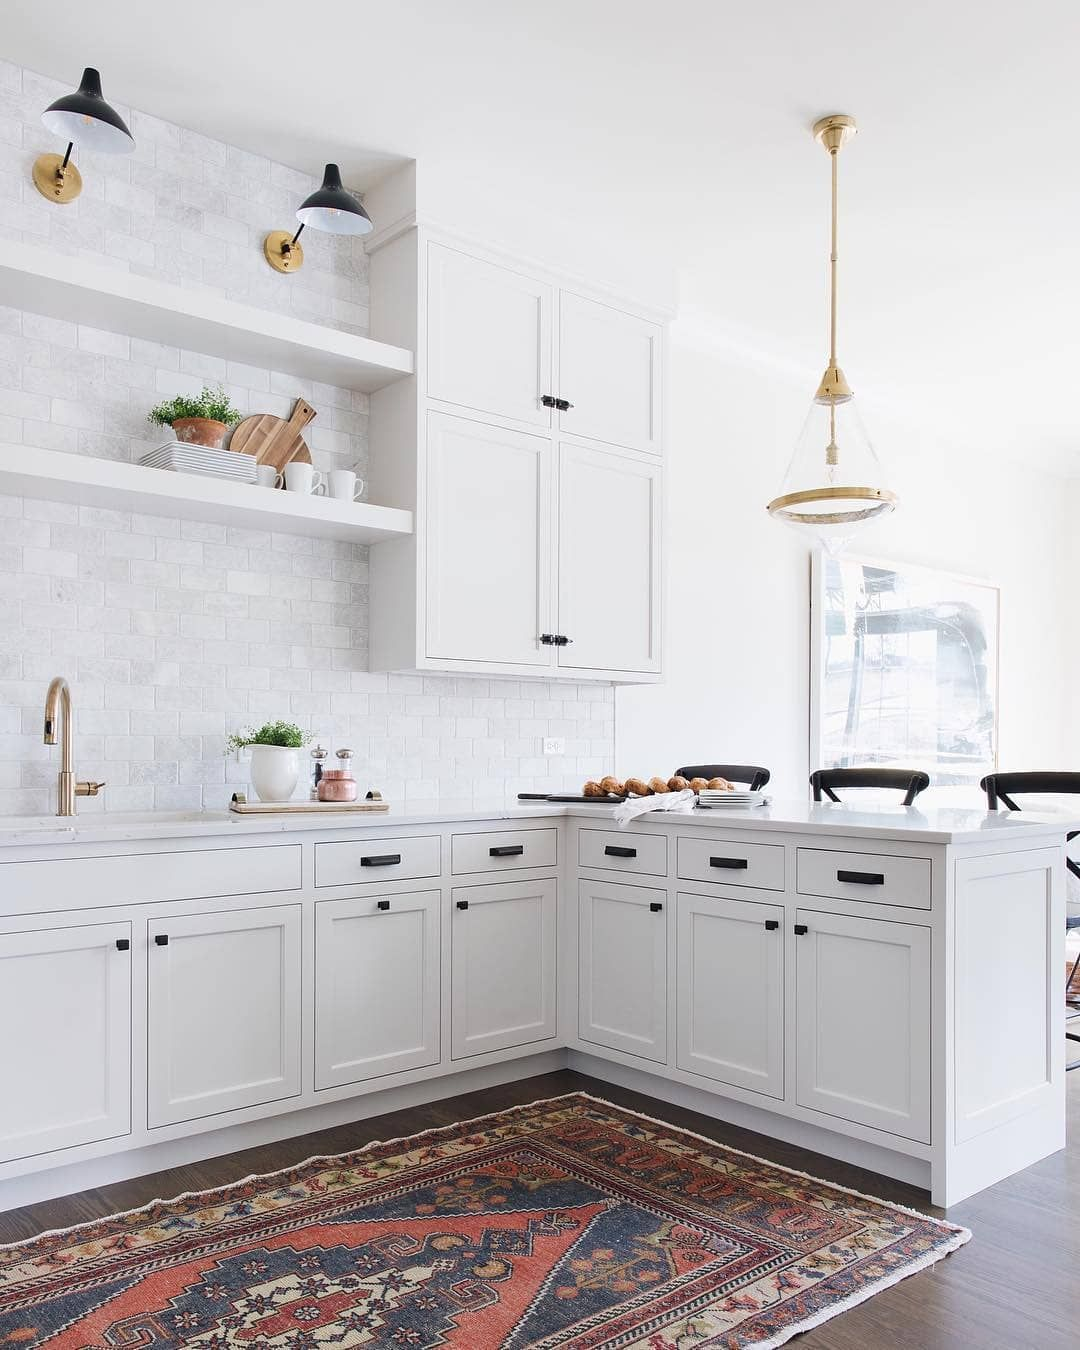 White Kitchen With Aerin Sconces And Vintage Style Kilim Rug Home Decor Kitchen Kitchen Plans Kitchen Style